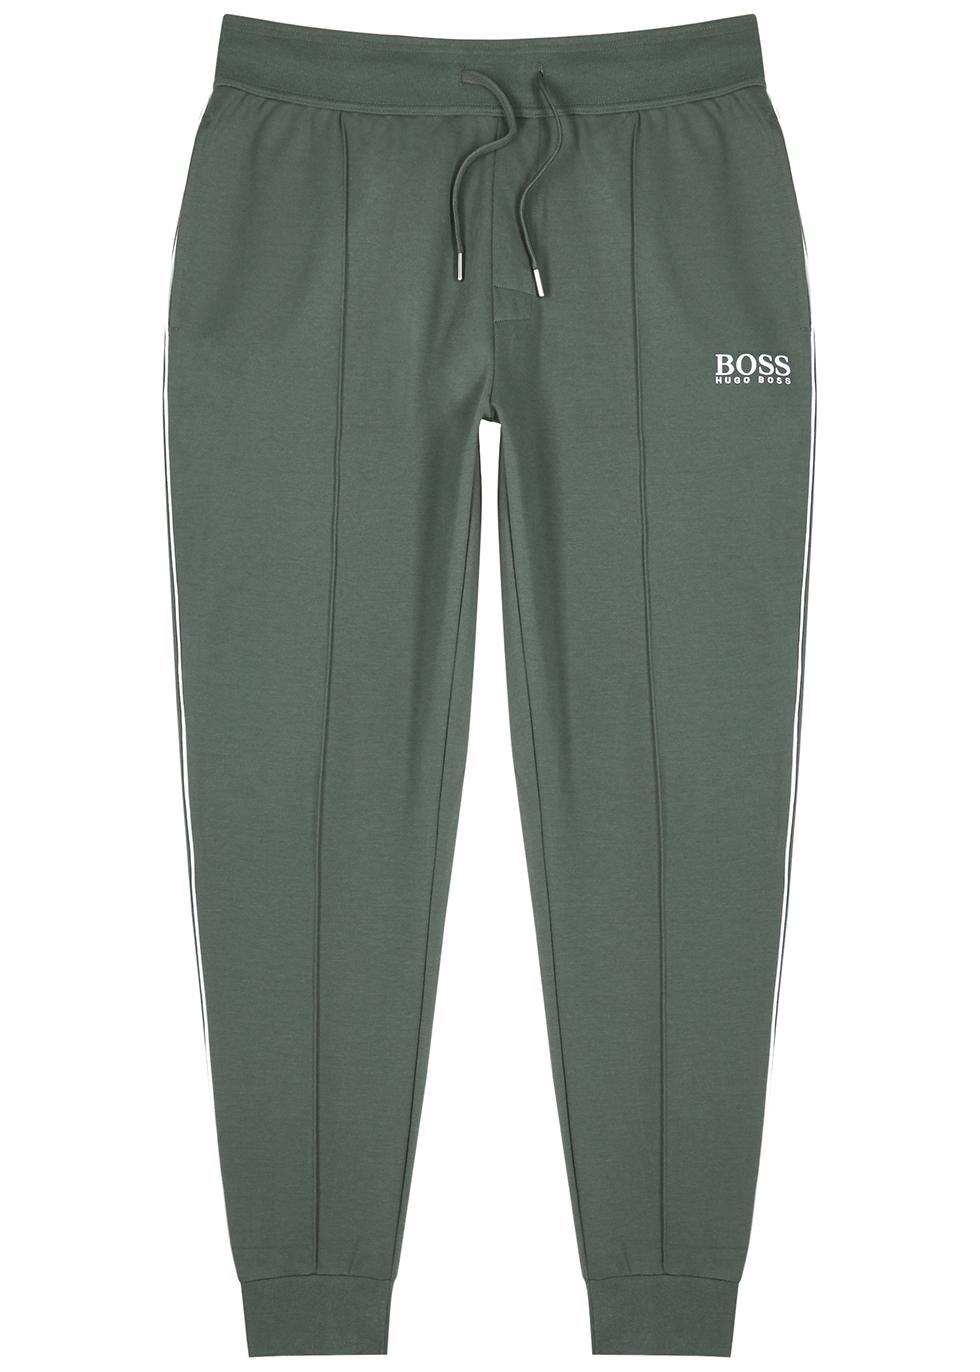 Green jersey sweatpants